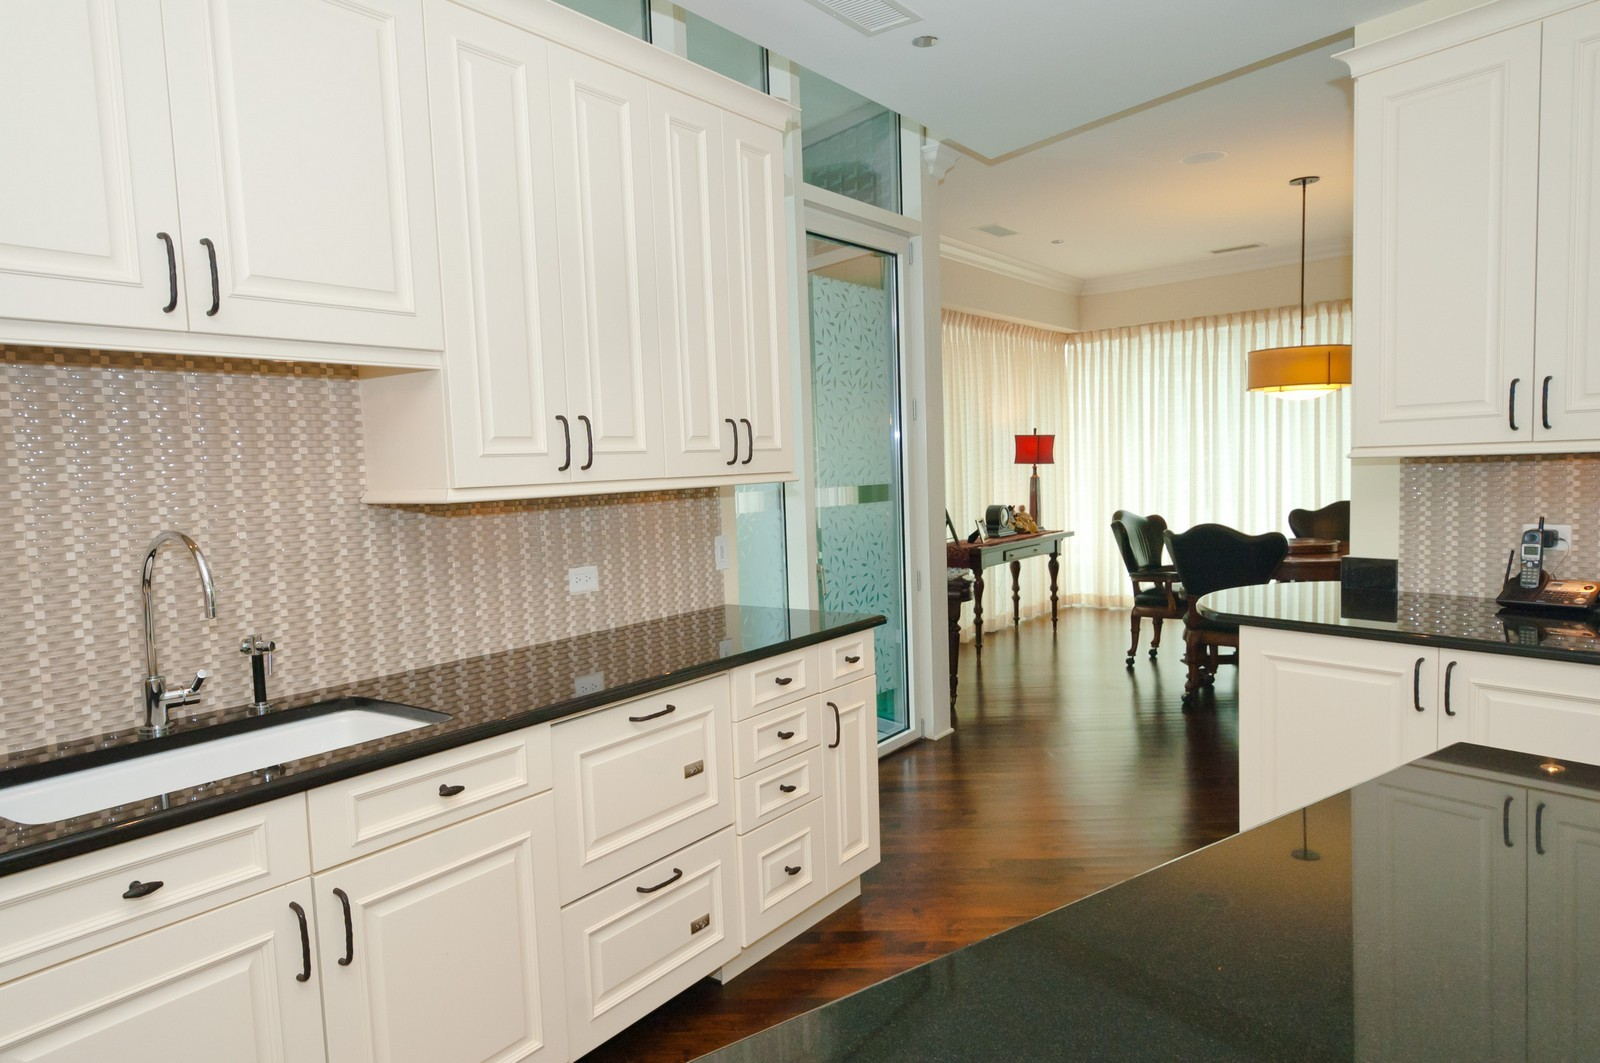 Real Estate Photography - 50 E. Chestnut, Apt 1001, Chicago, IL, 60611 - Location 1